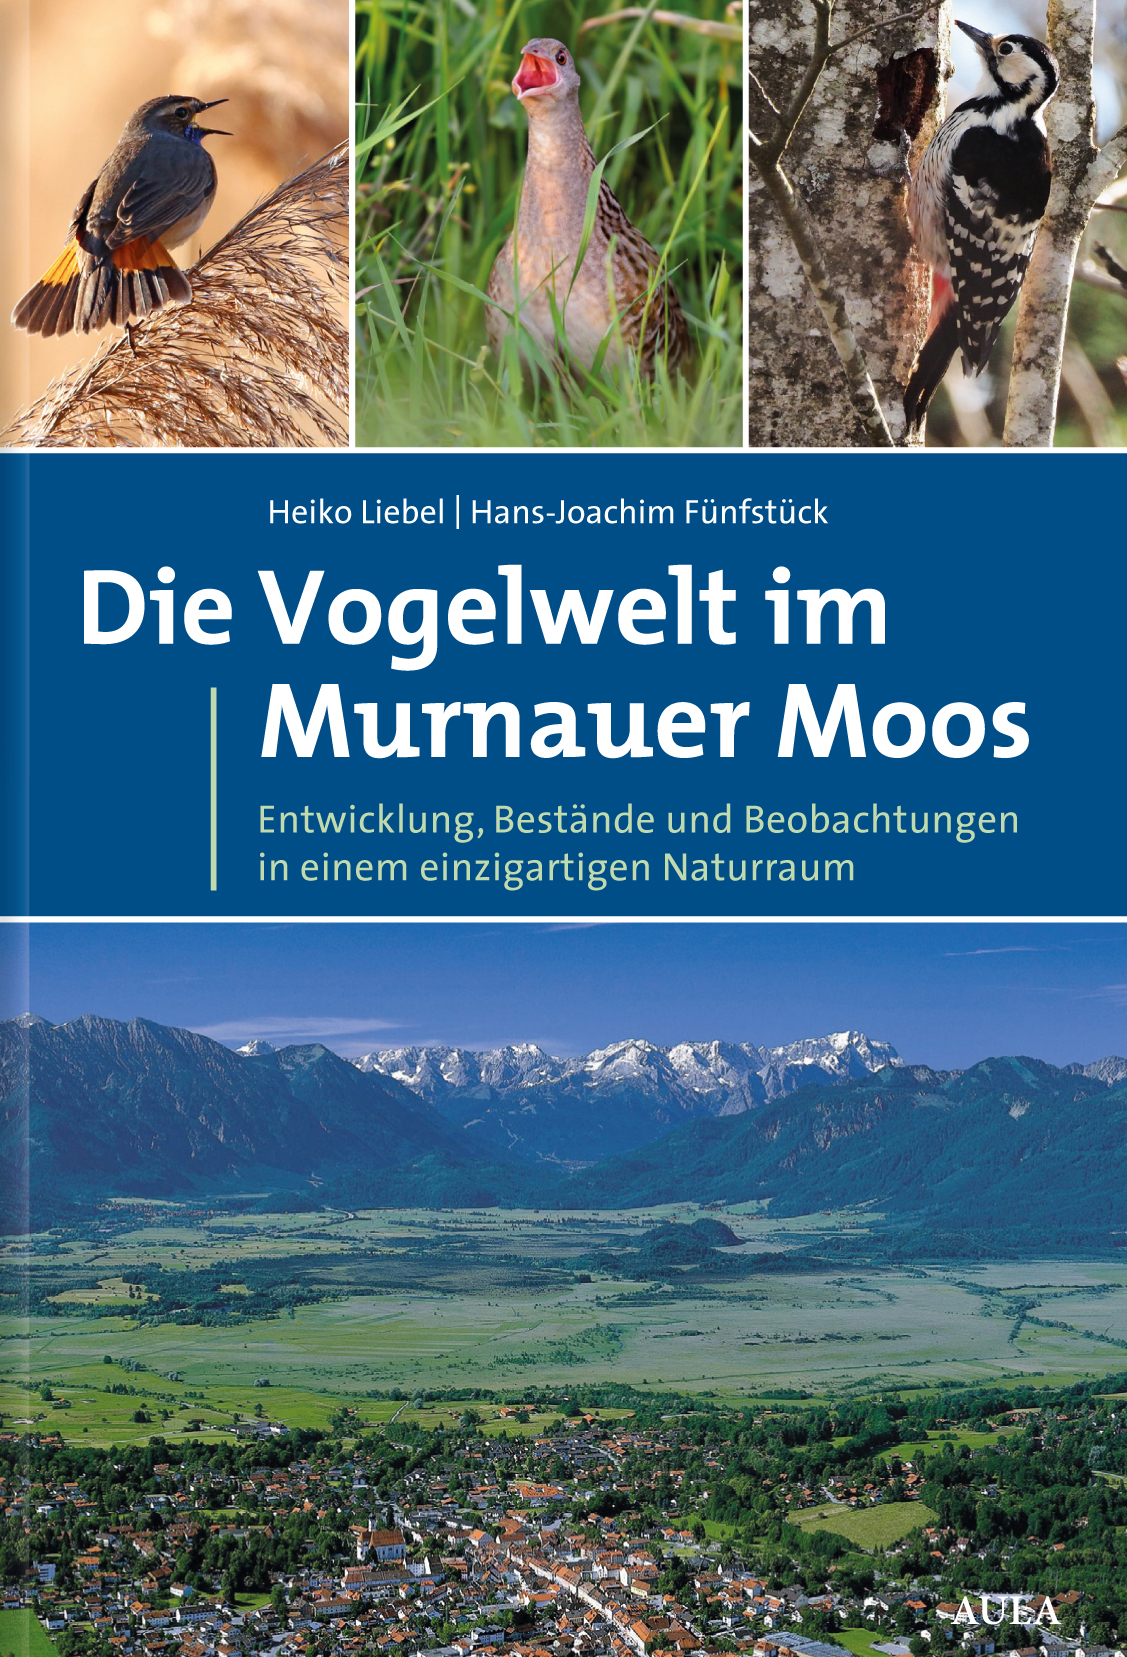 Vogelwelt-im-Murnauer-Moos.jpg